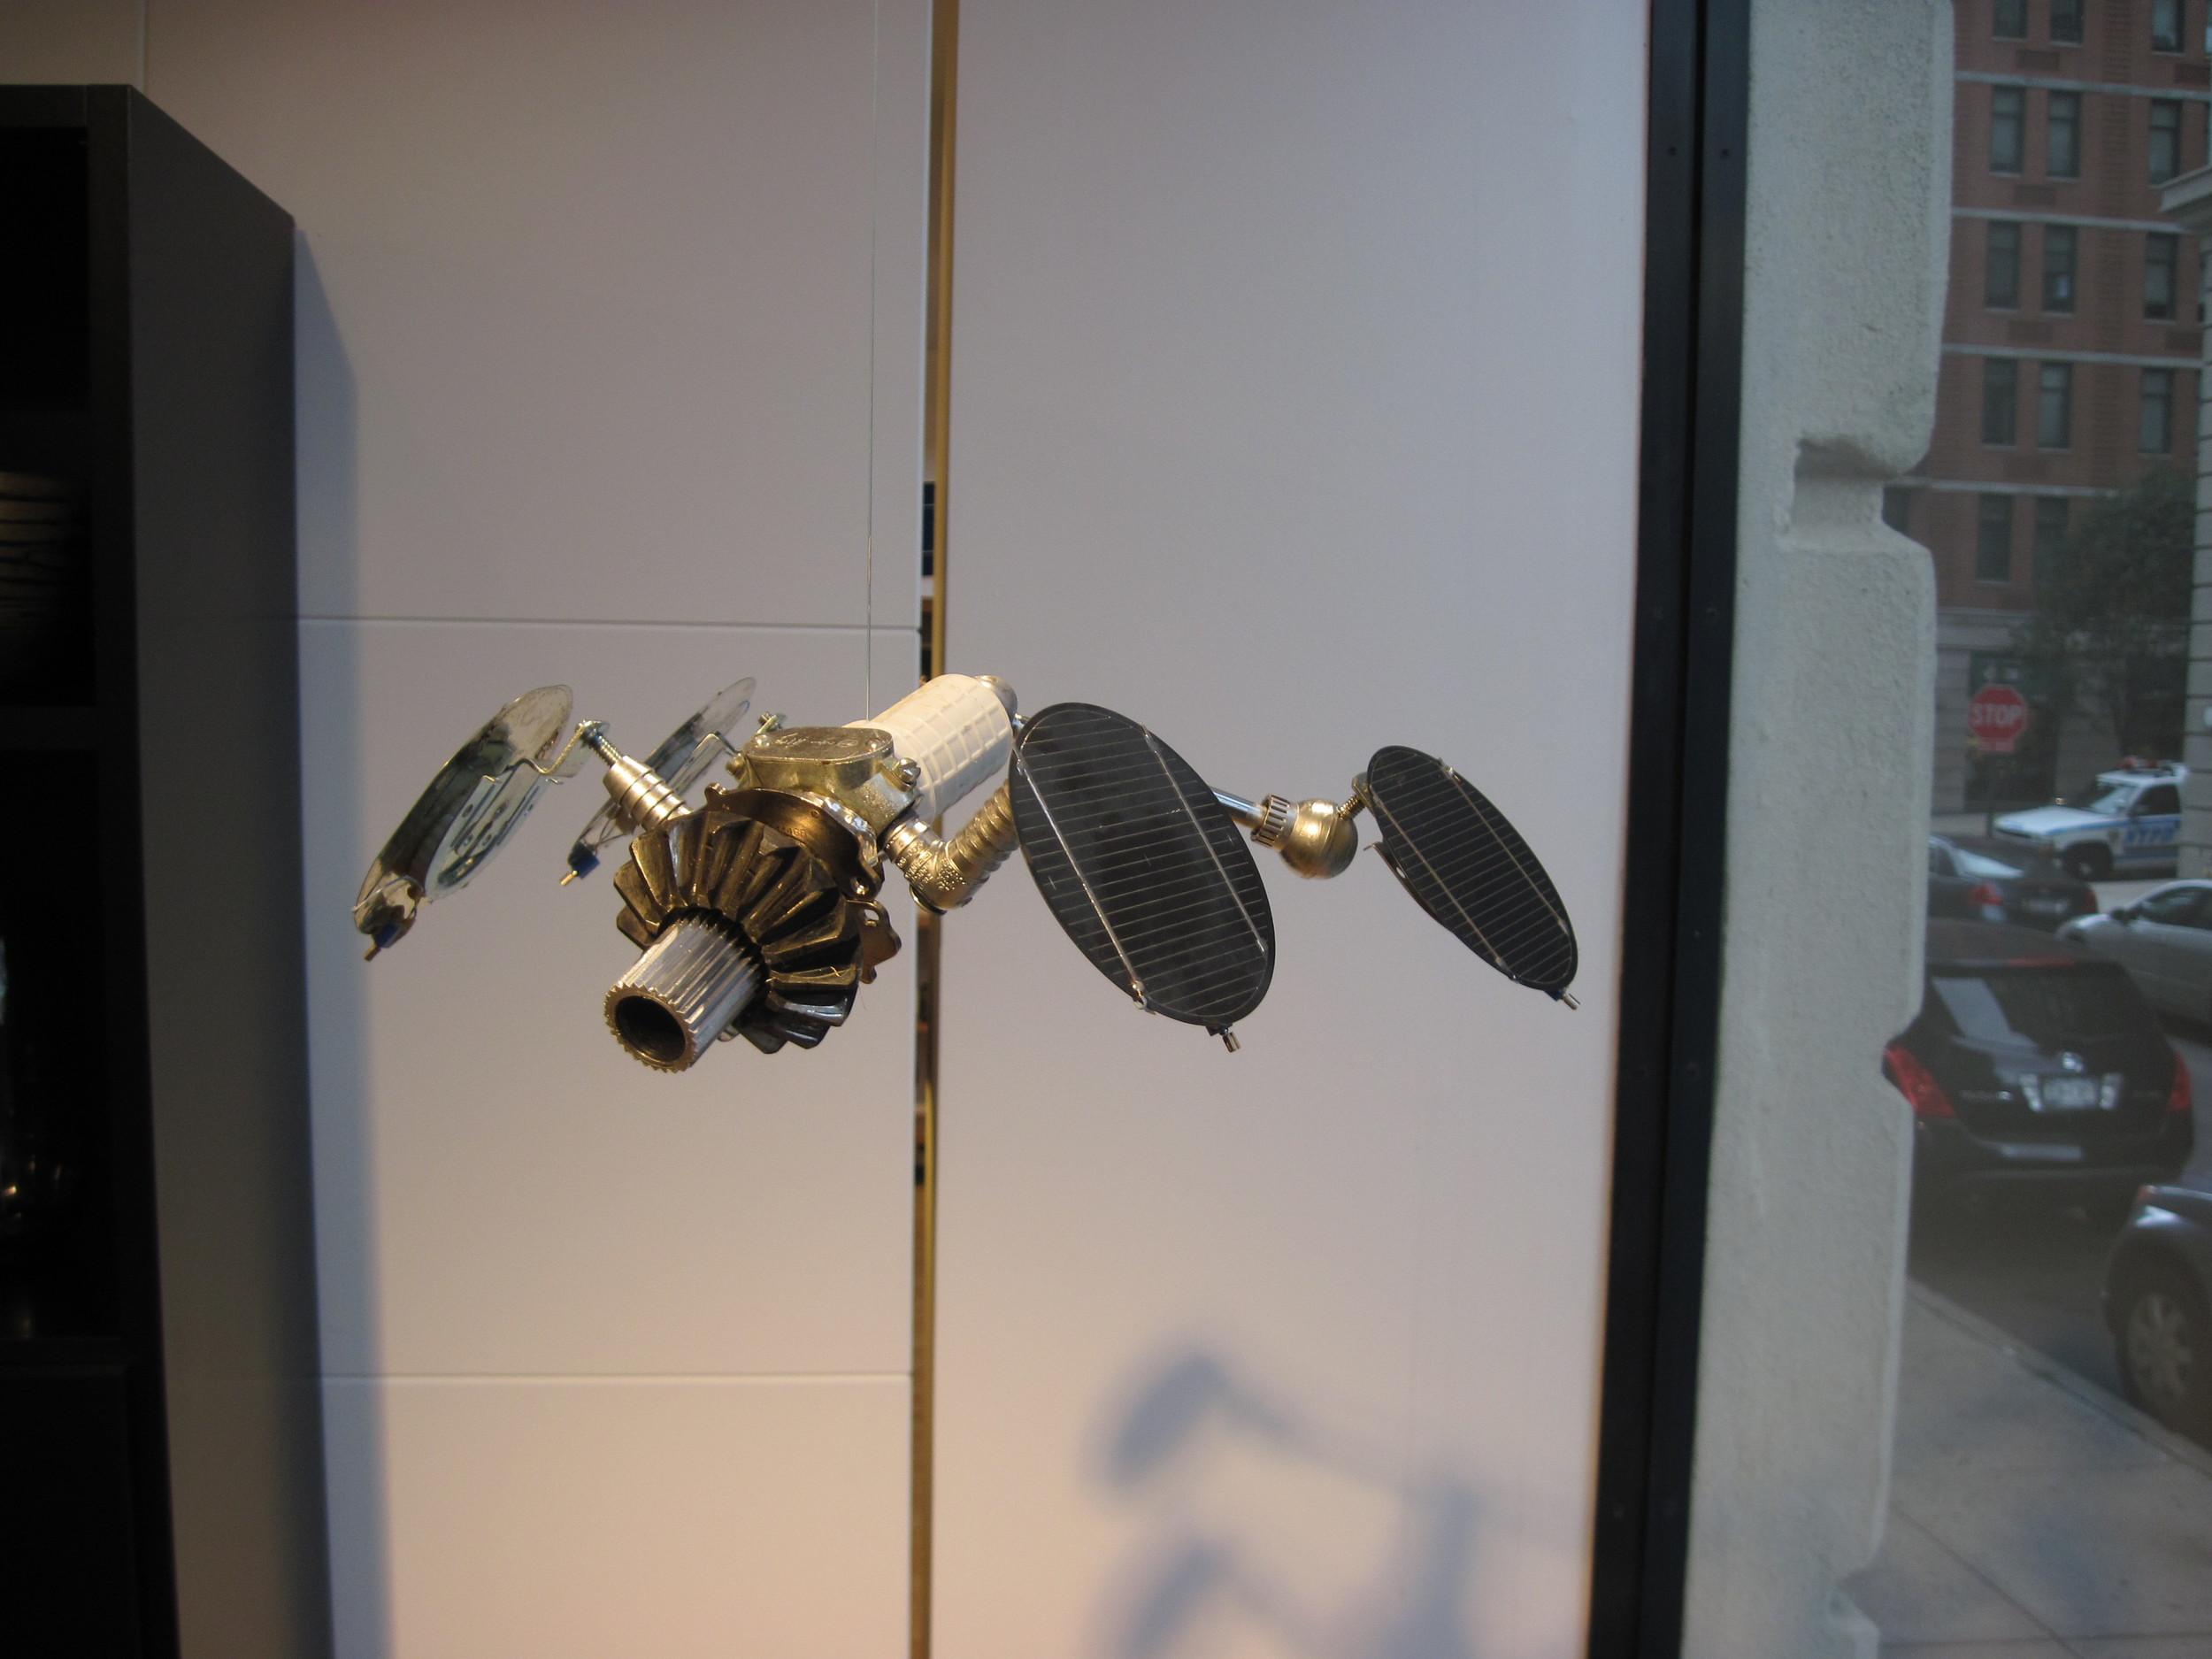 Vibrating Satellite